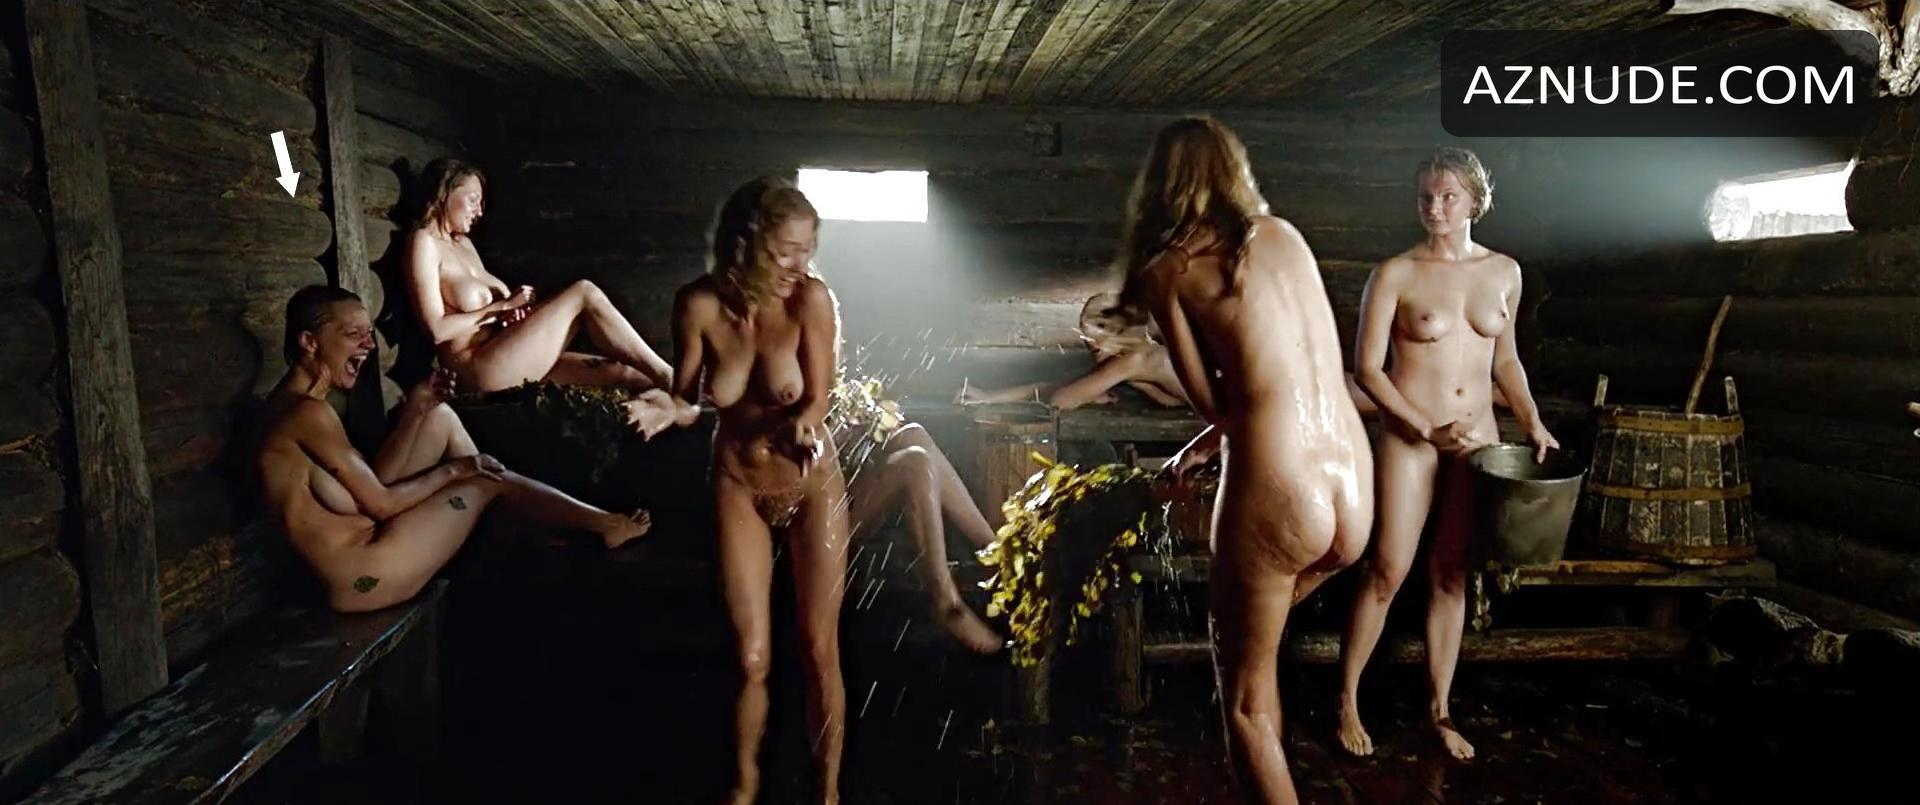 Fuck Anastasiya Mikulchina naked (52 photo), Ass, Hot, Instagram, in bikini 2006